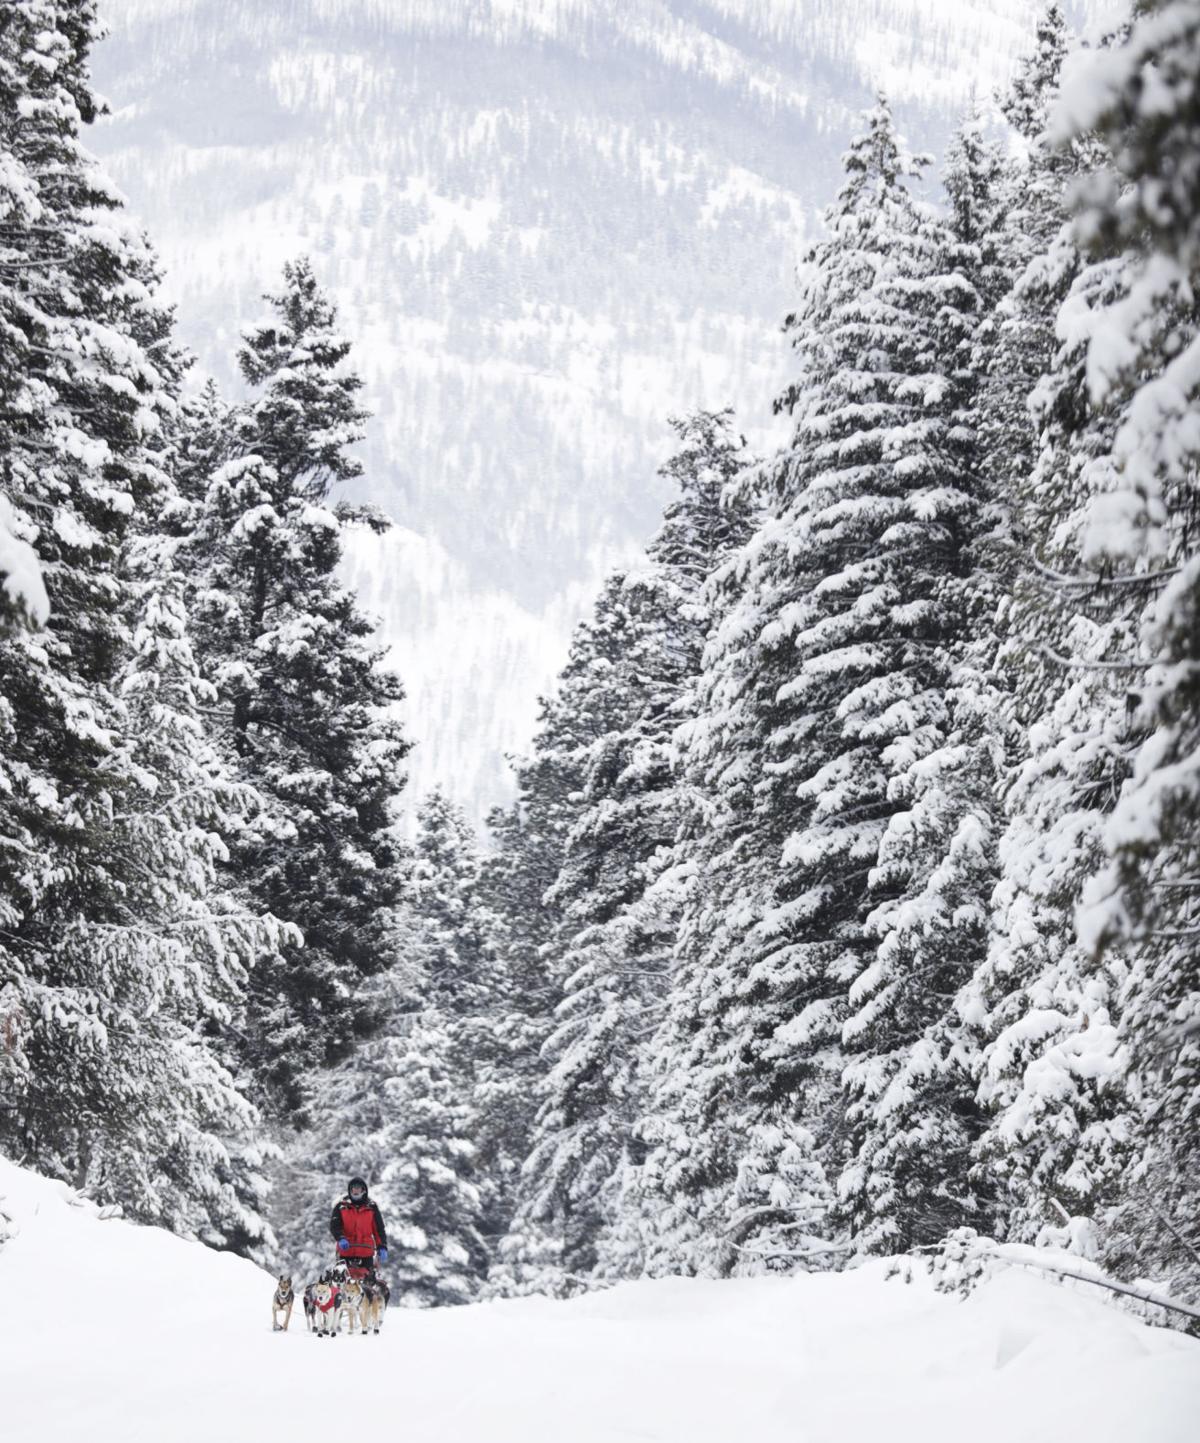 Snowy Race to the Sky